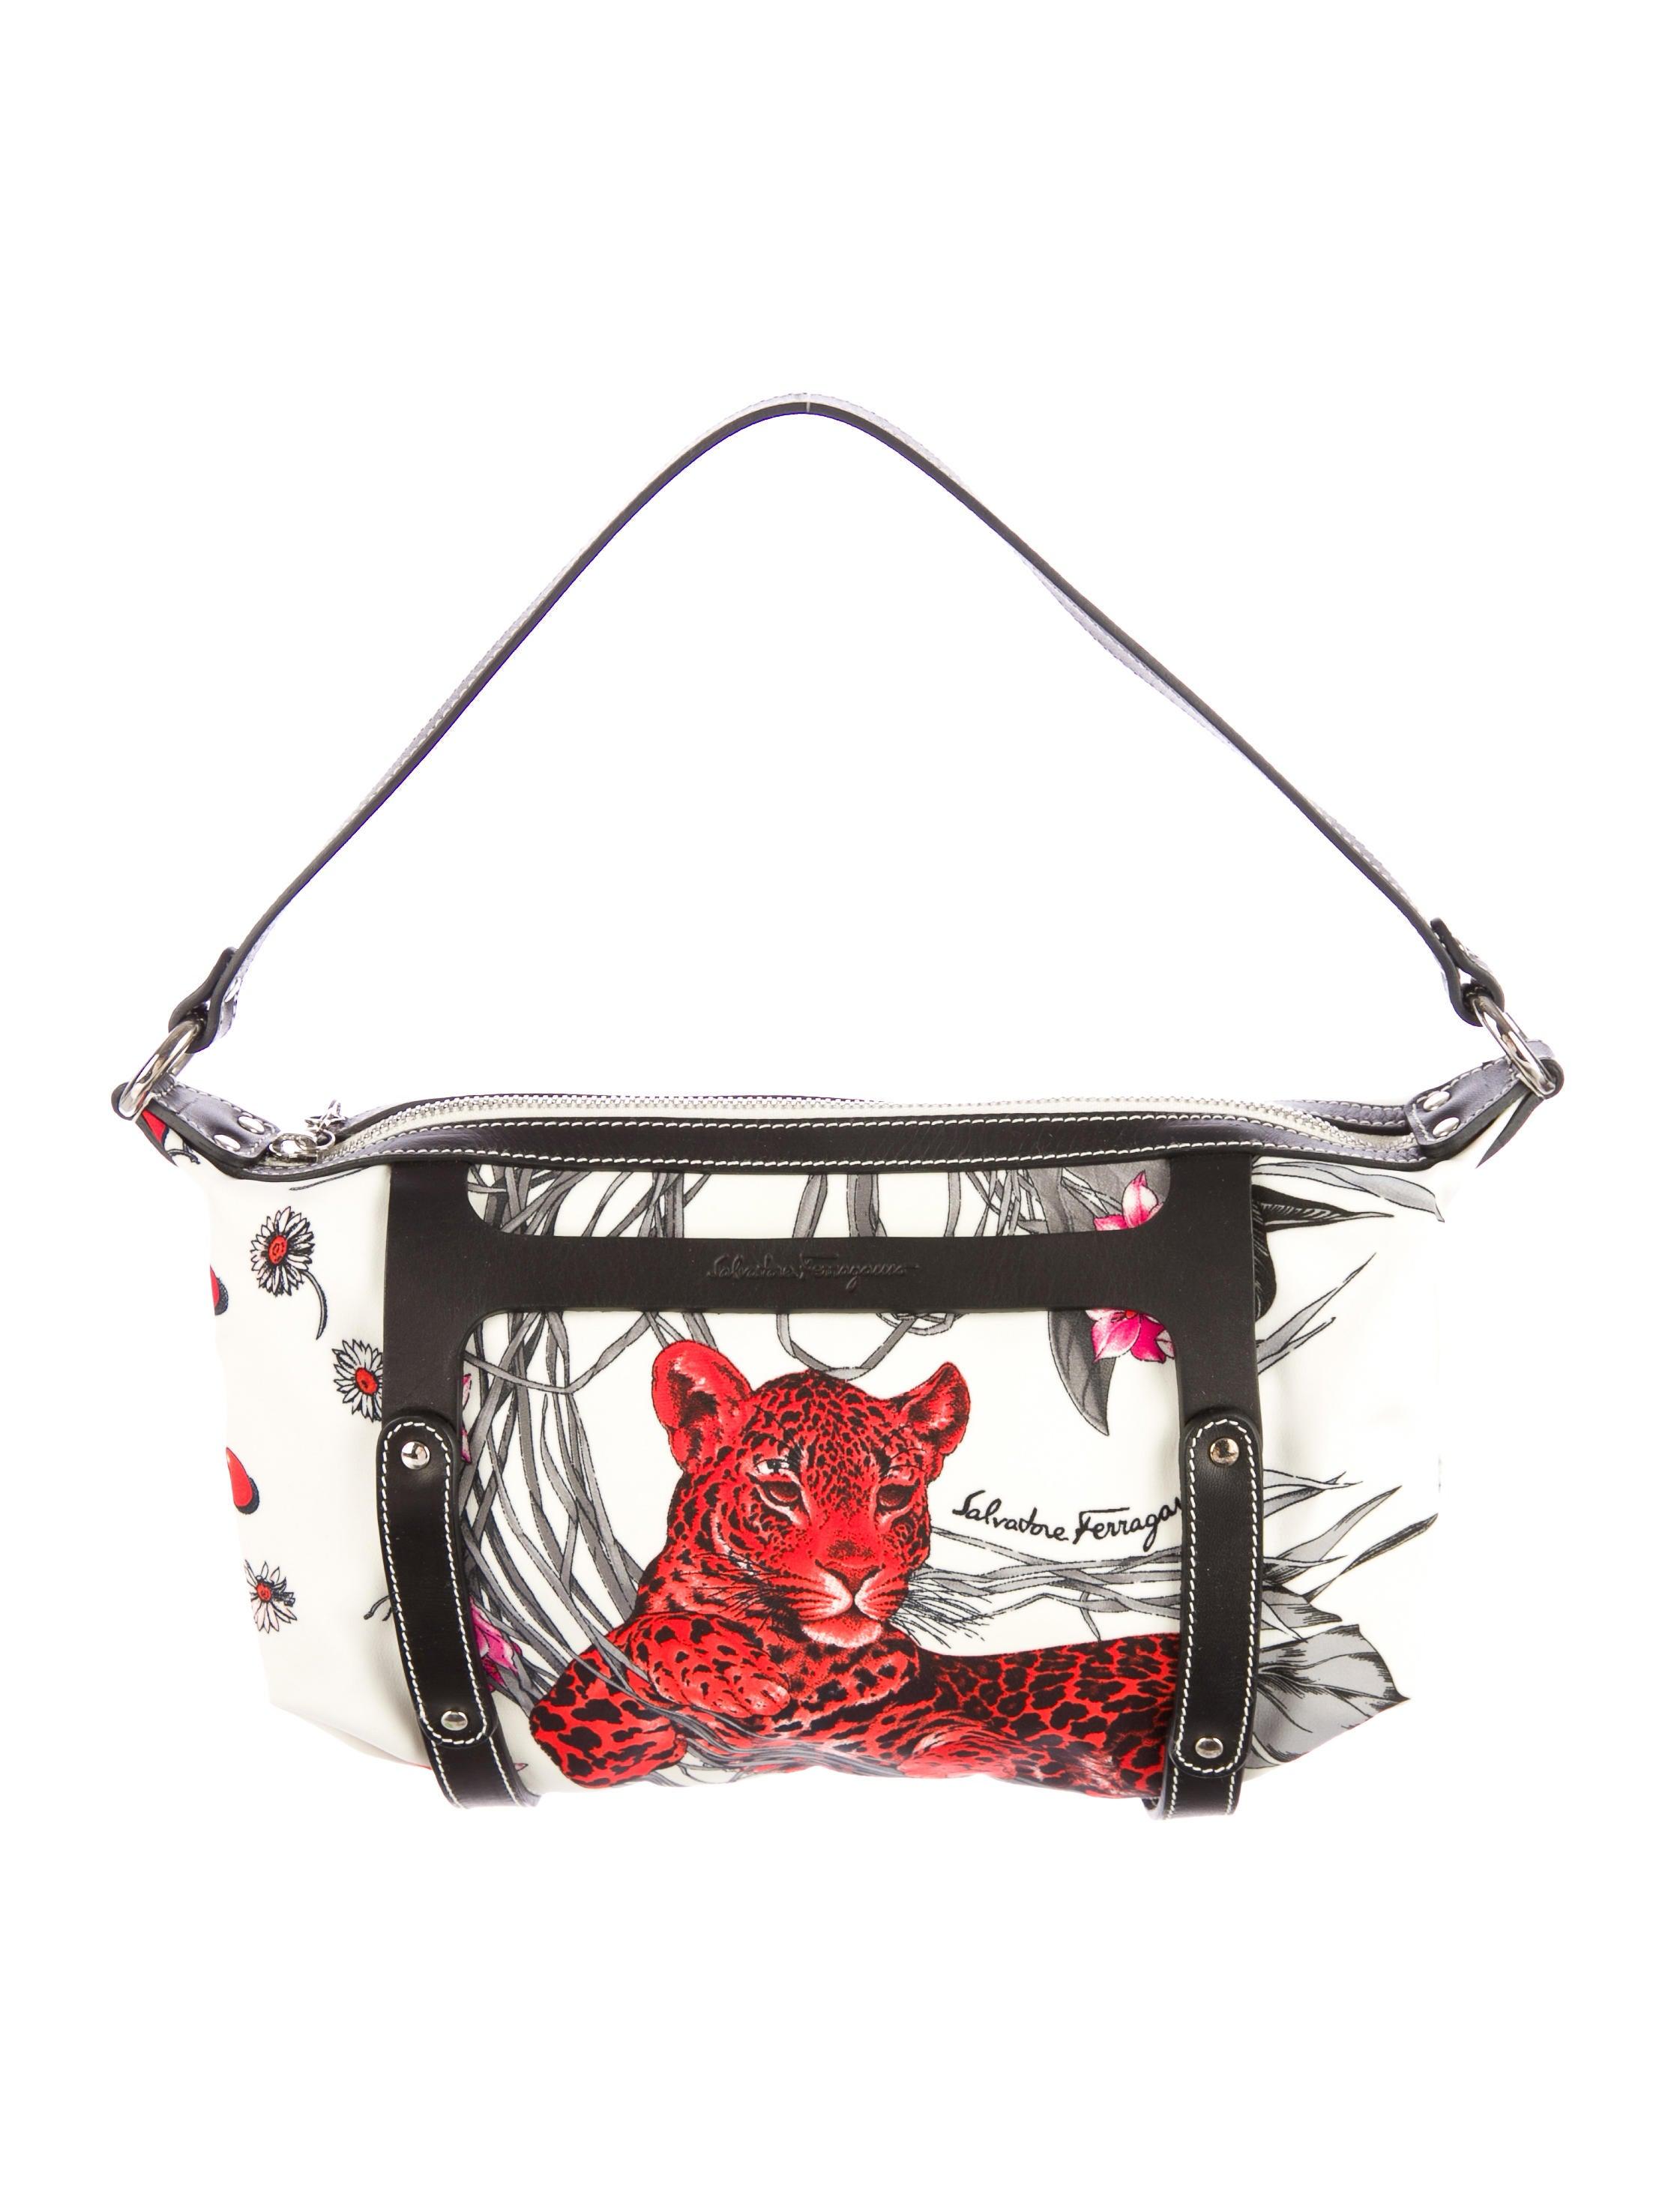 5de673910495 Salvatore Ferragamo Fiera Print Nylon Bag - Handbags - SAL29366 ...